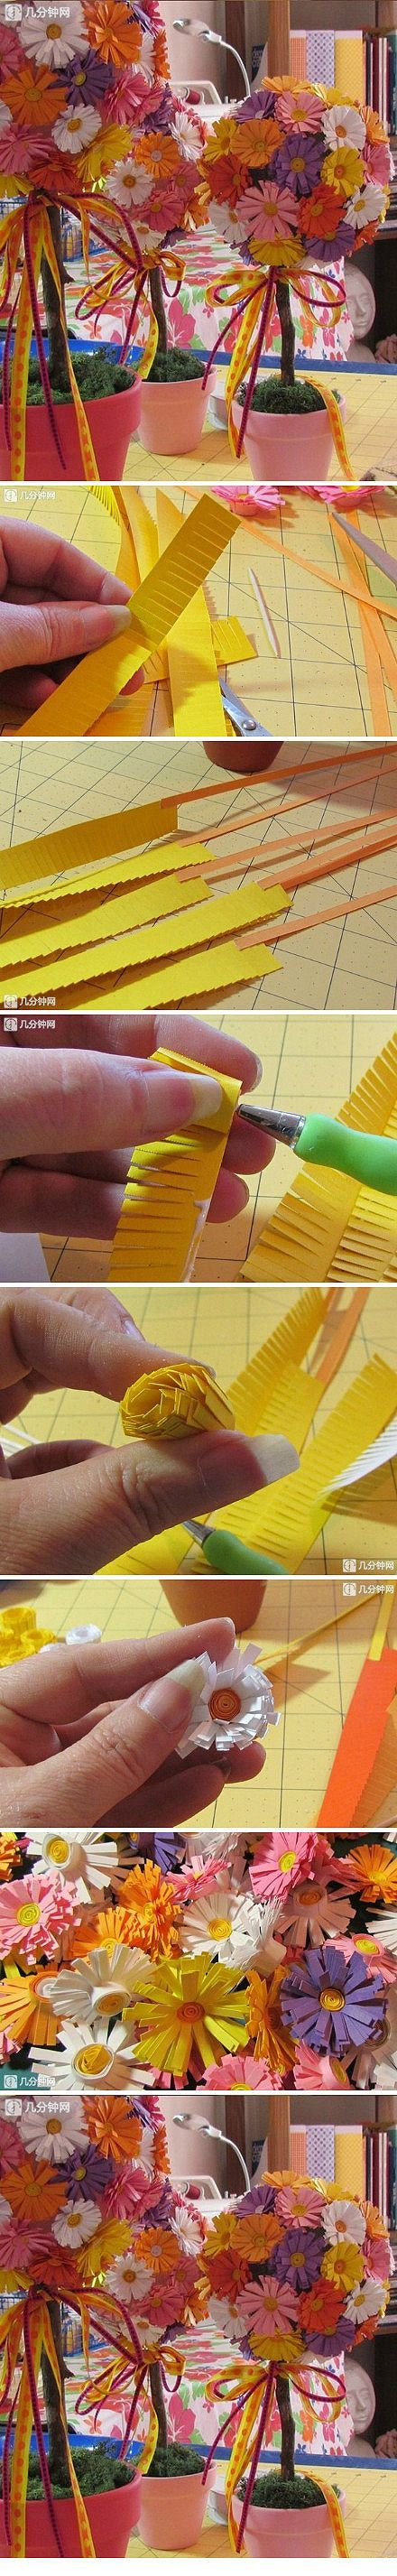 DIY DIY handmade origami paper art Liangtu daisies made of paper, very fresh (via a few network) <br/>